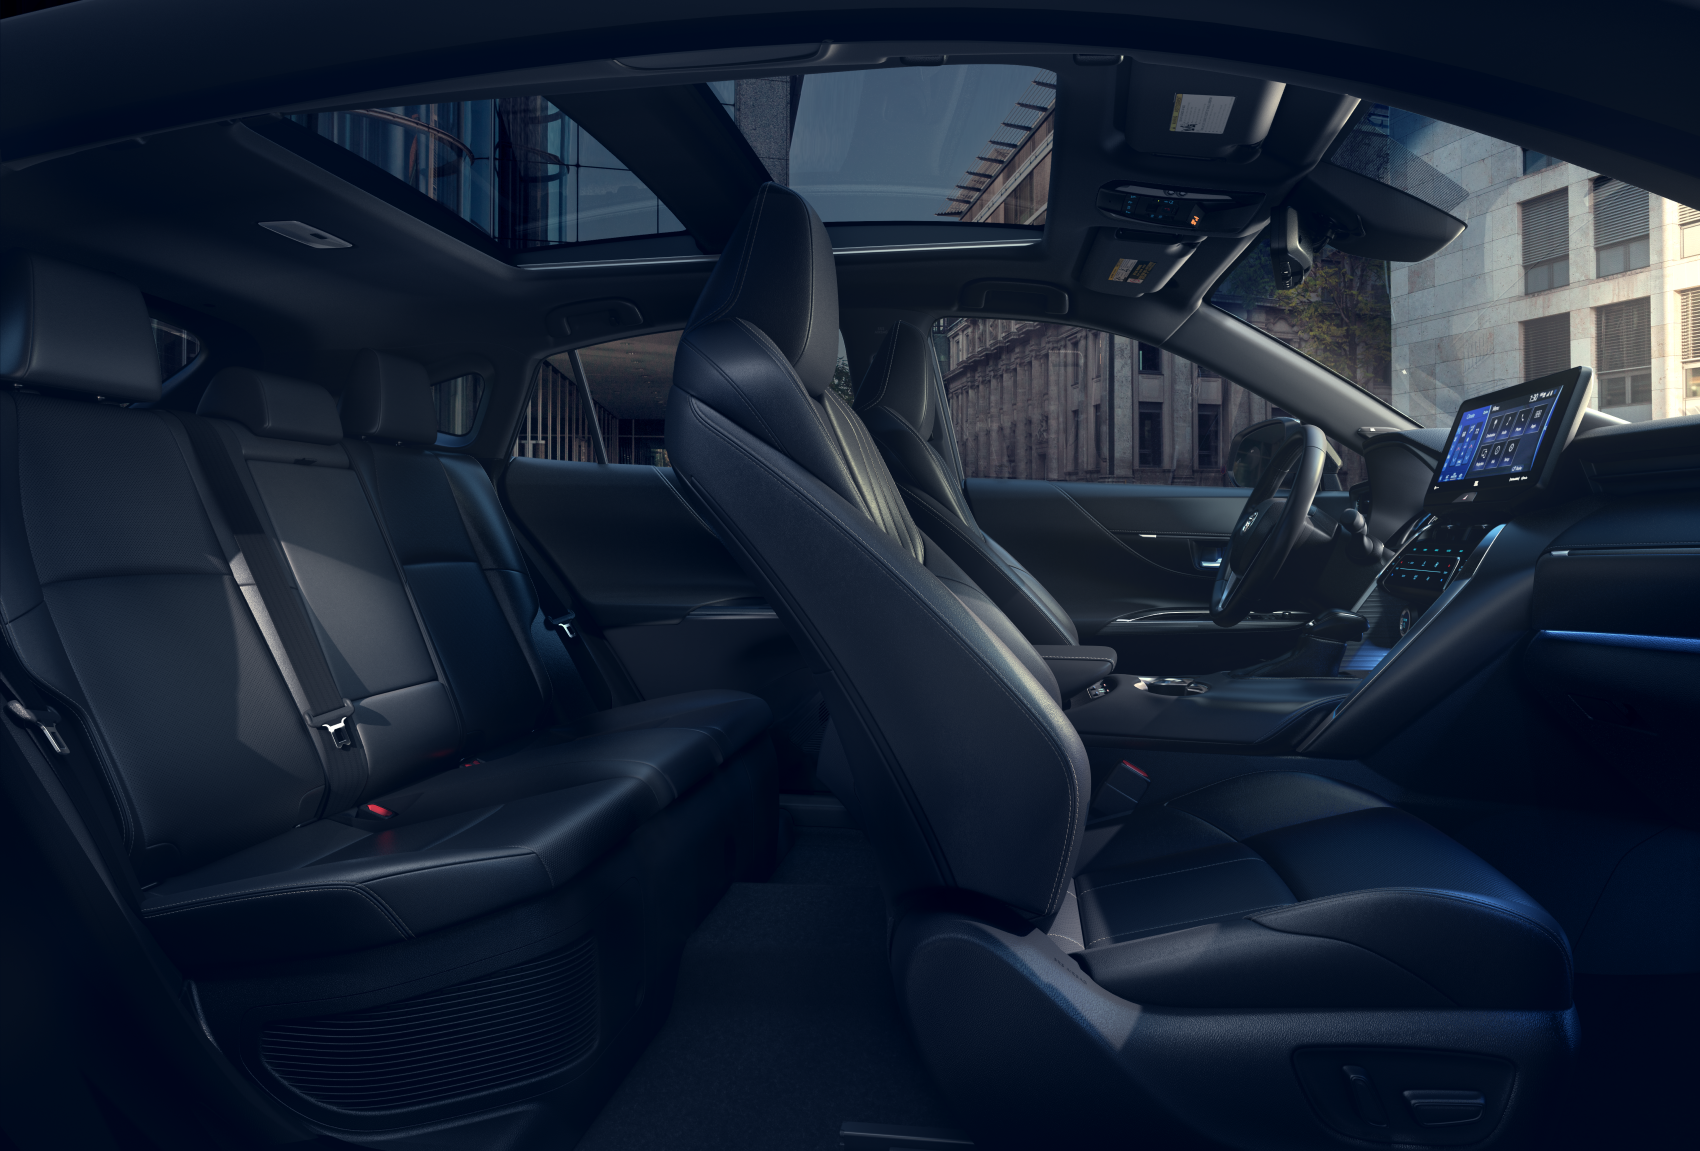 2021 Toyota Venza Interior Seating